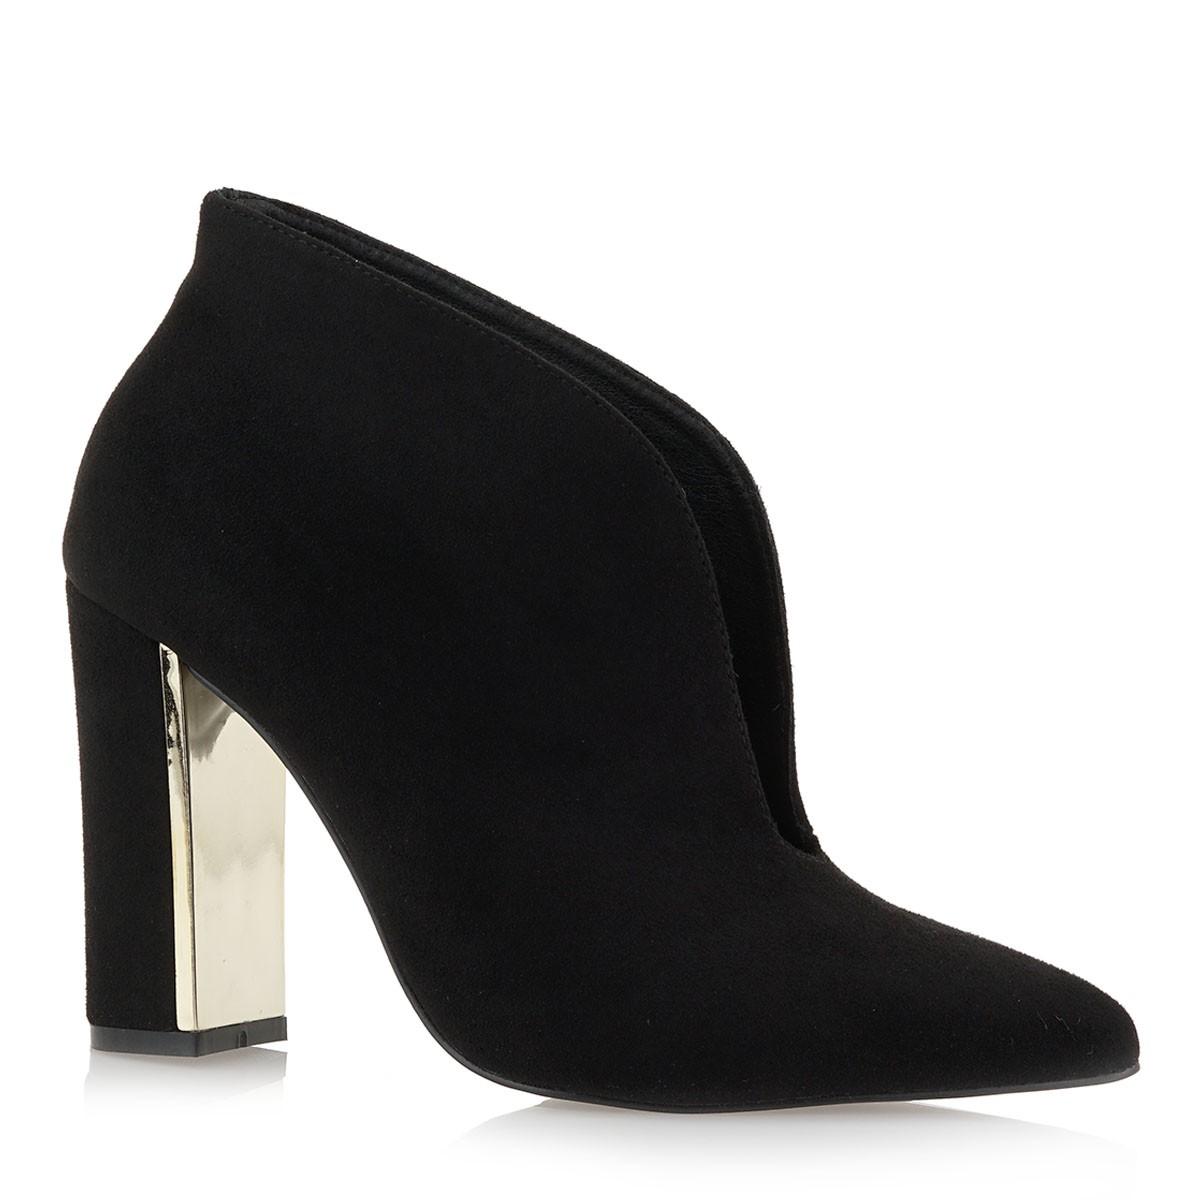 Exe Shoes Γυναικεία ANKLE BOOTS Μποτάκια PATRICIA-922 Μαύρo Καστόρι J37009225004